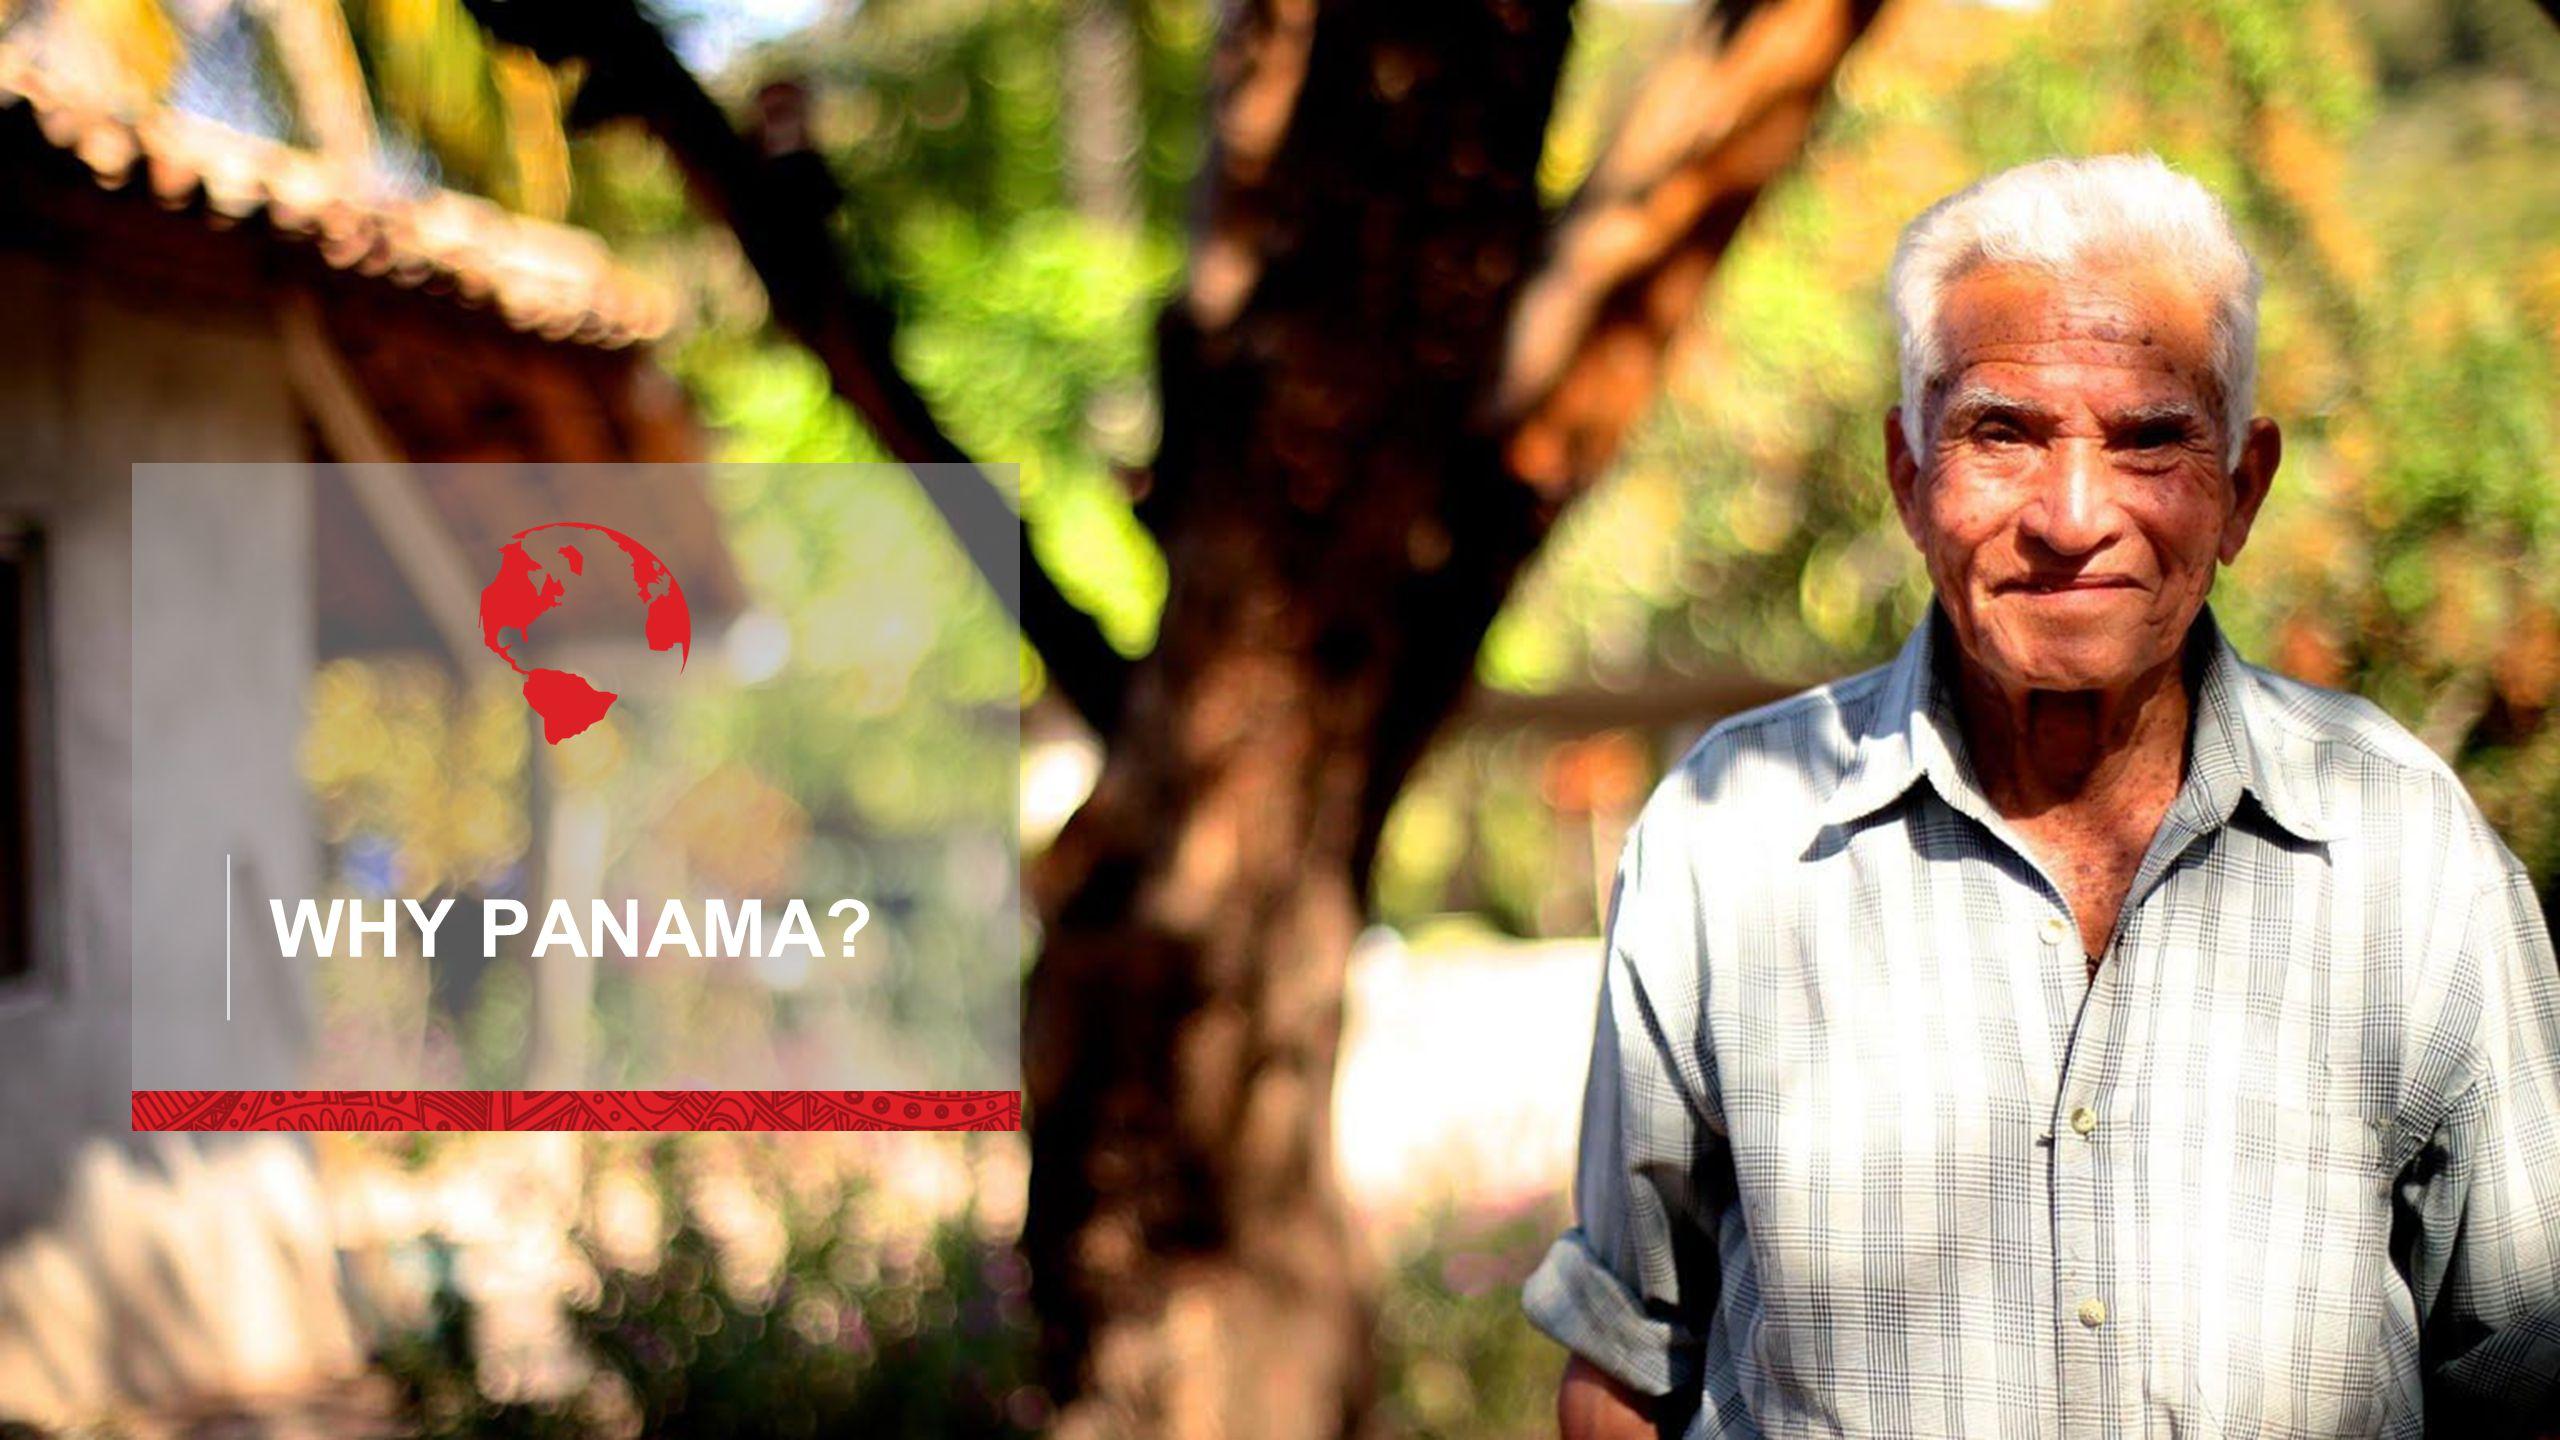 WHY PANAMA